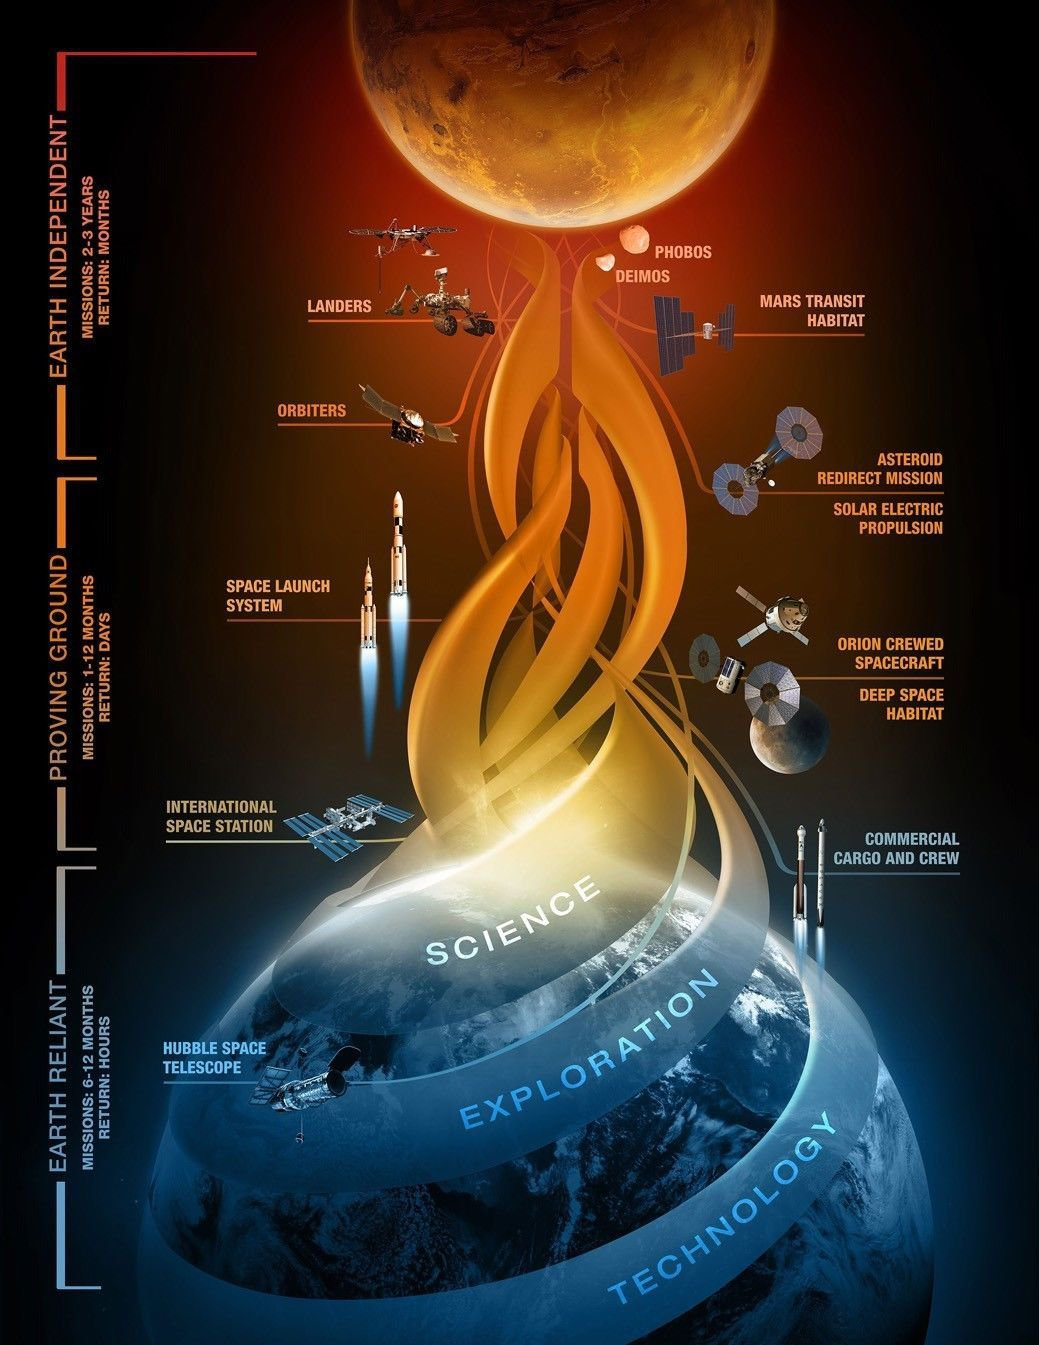 Explore Mars Art 32x24 Poster Decor